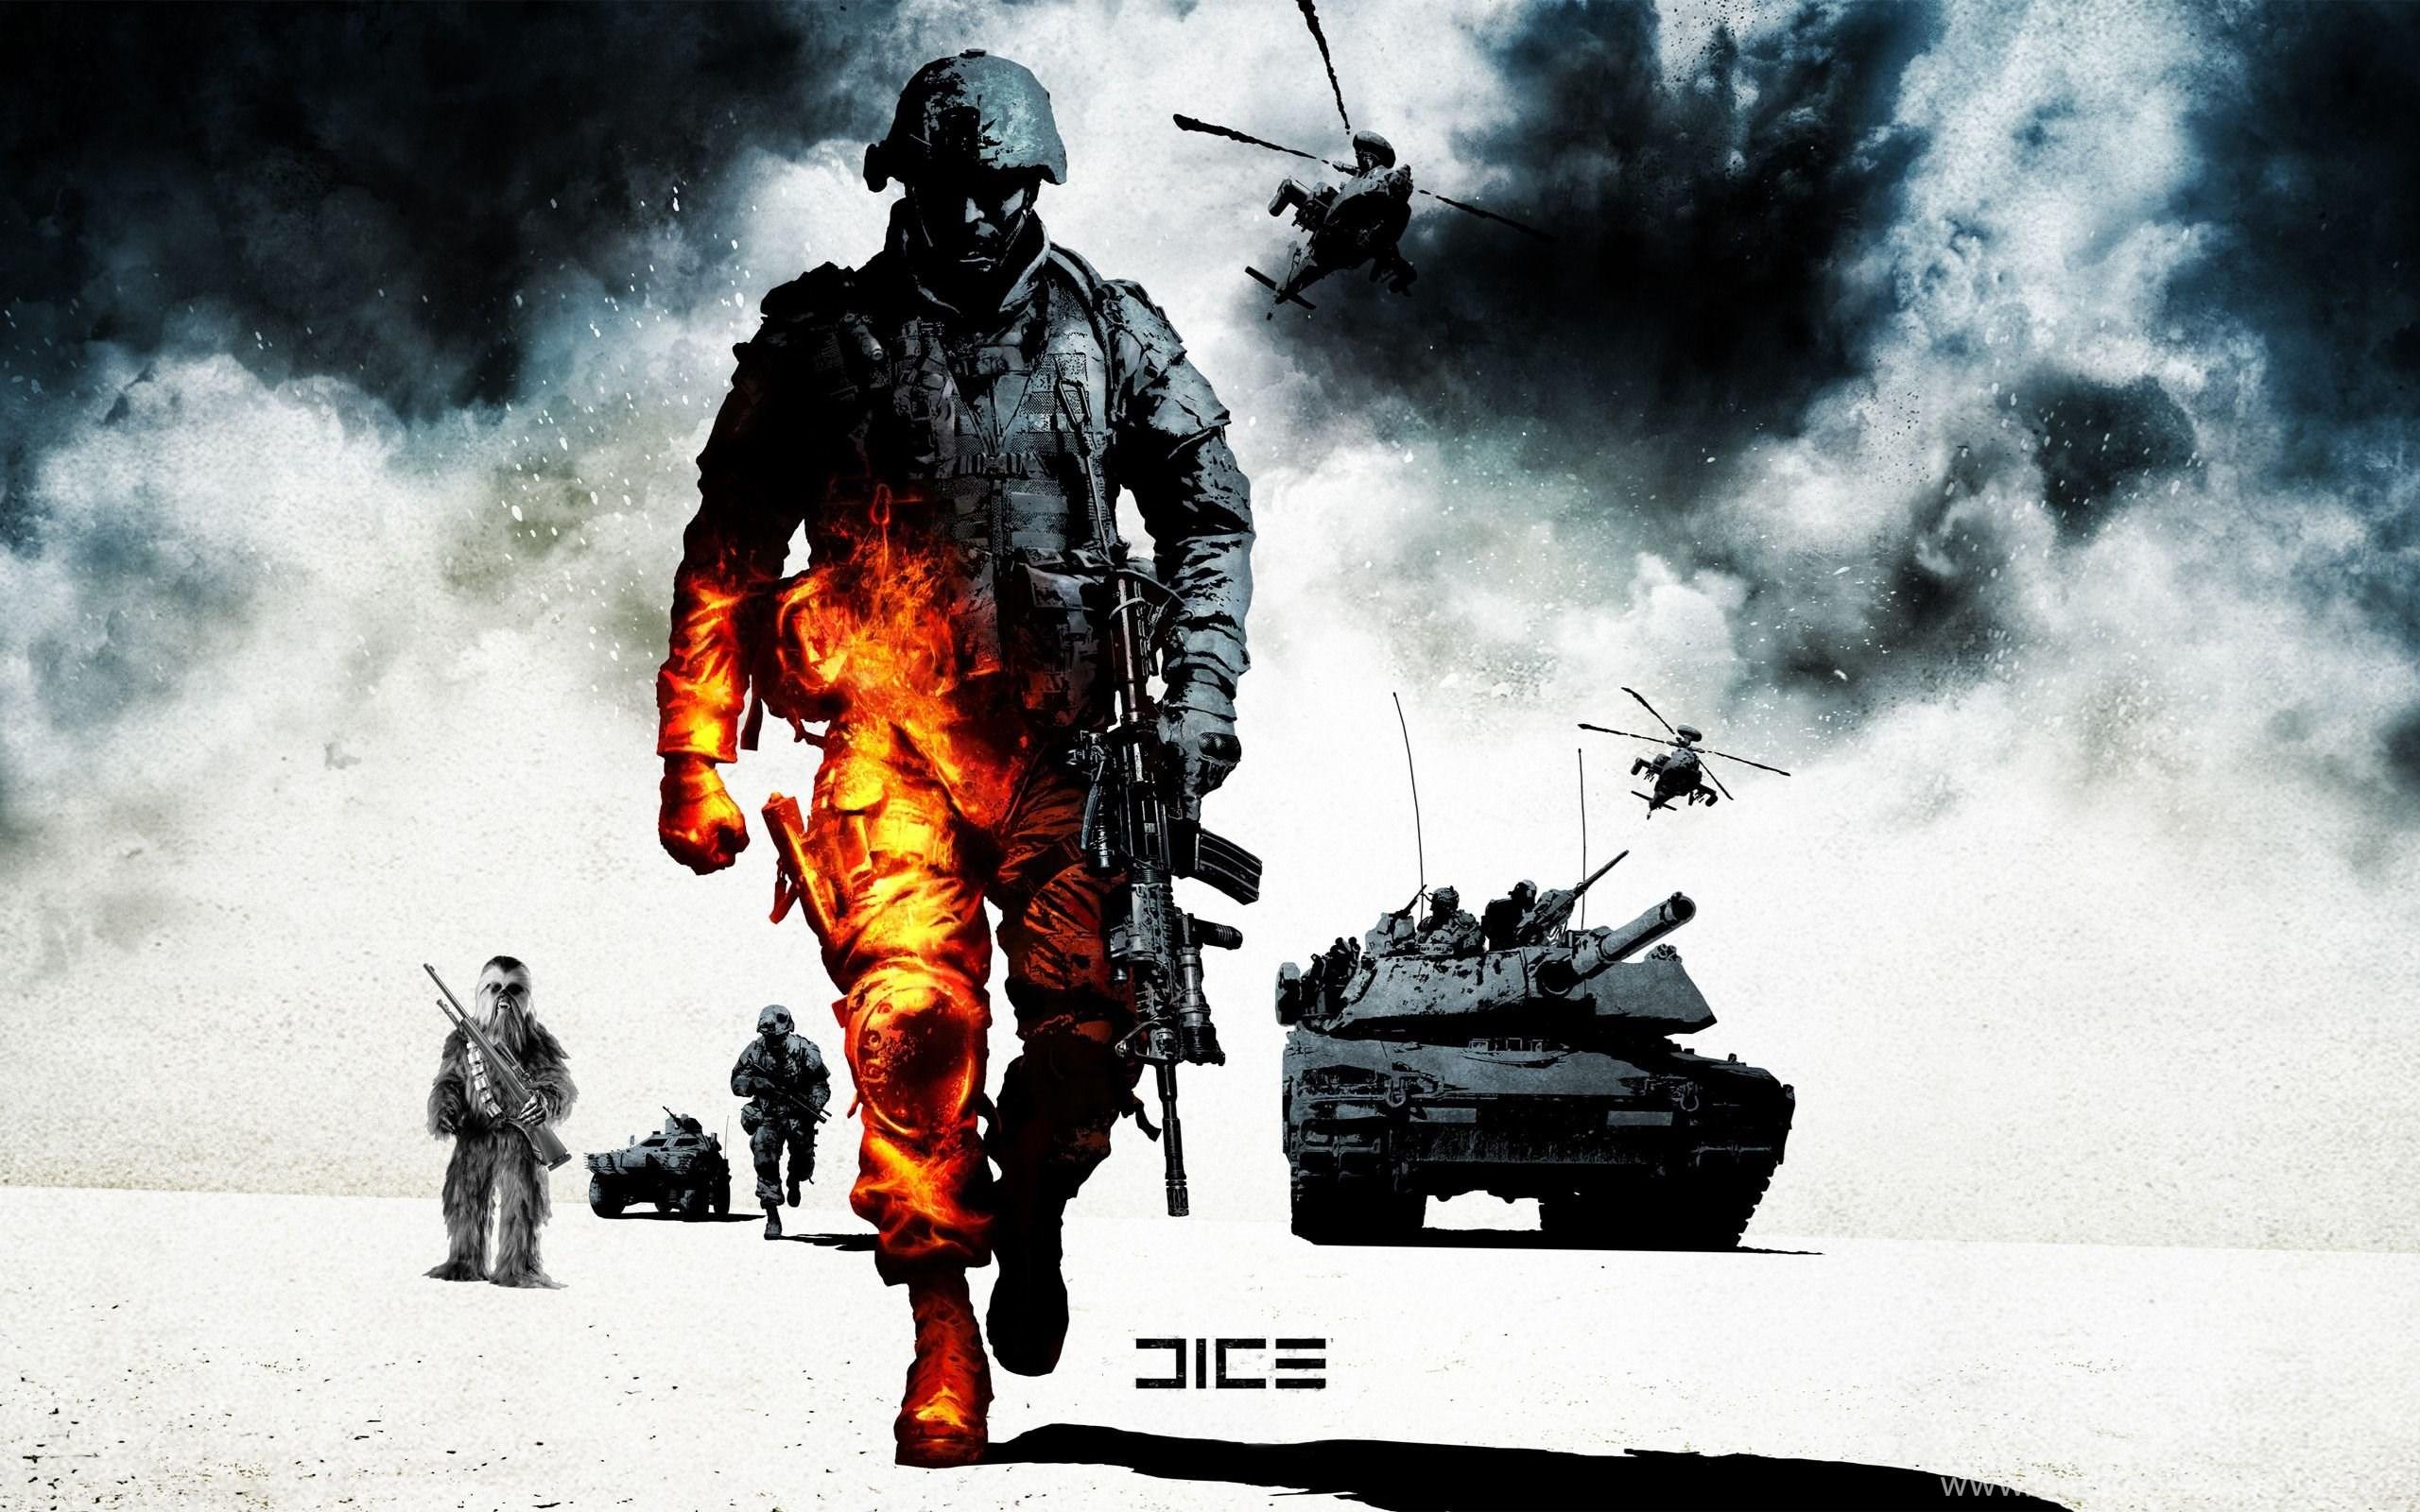 Battlefield Bad Company 2 Wallpapers Hd Wallpapers 156165 Desktop